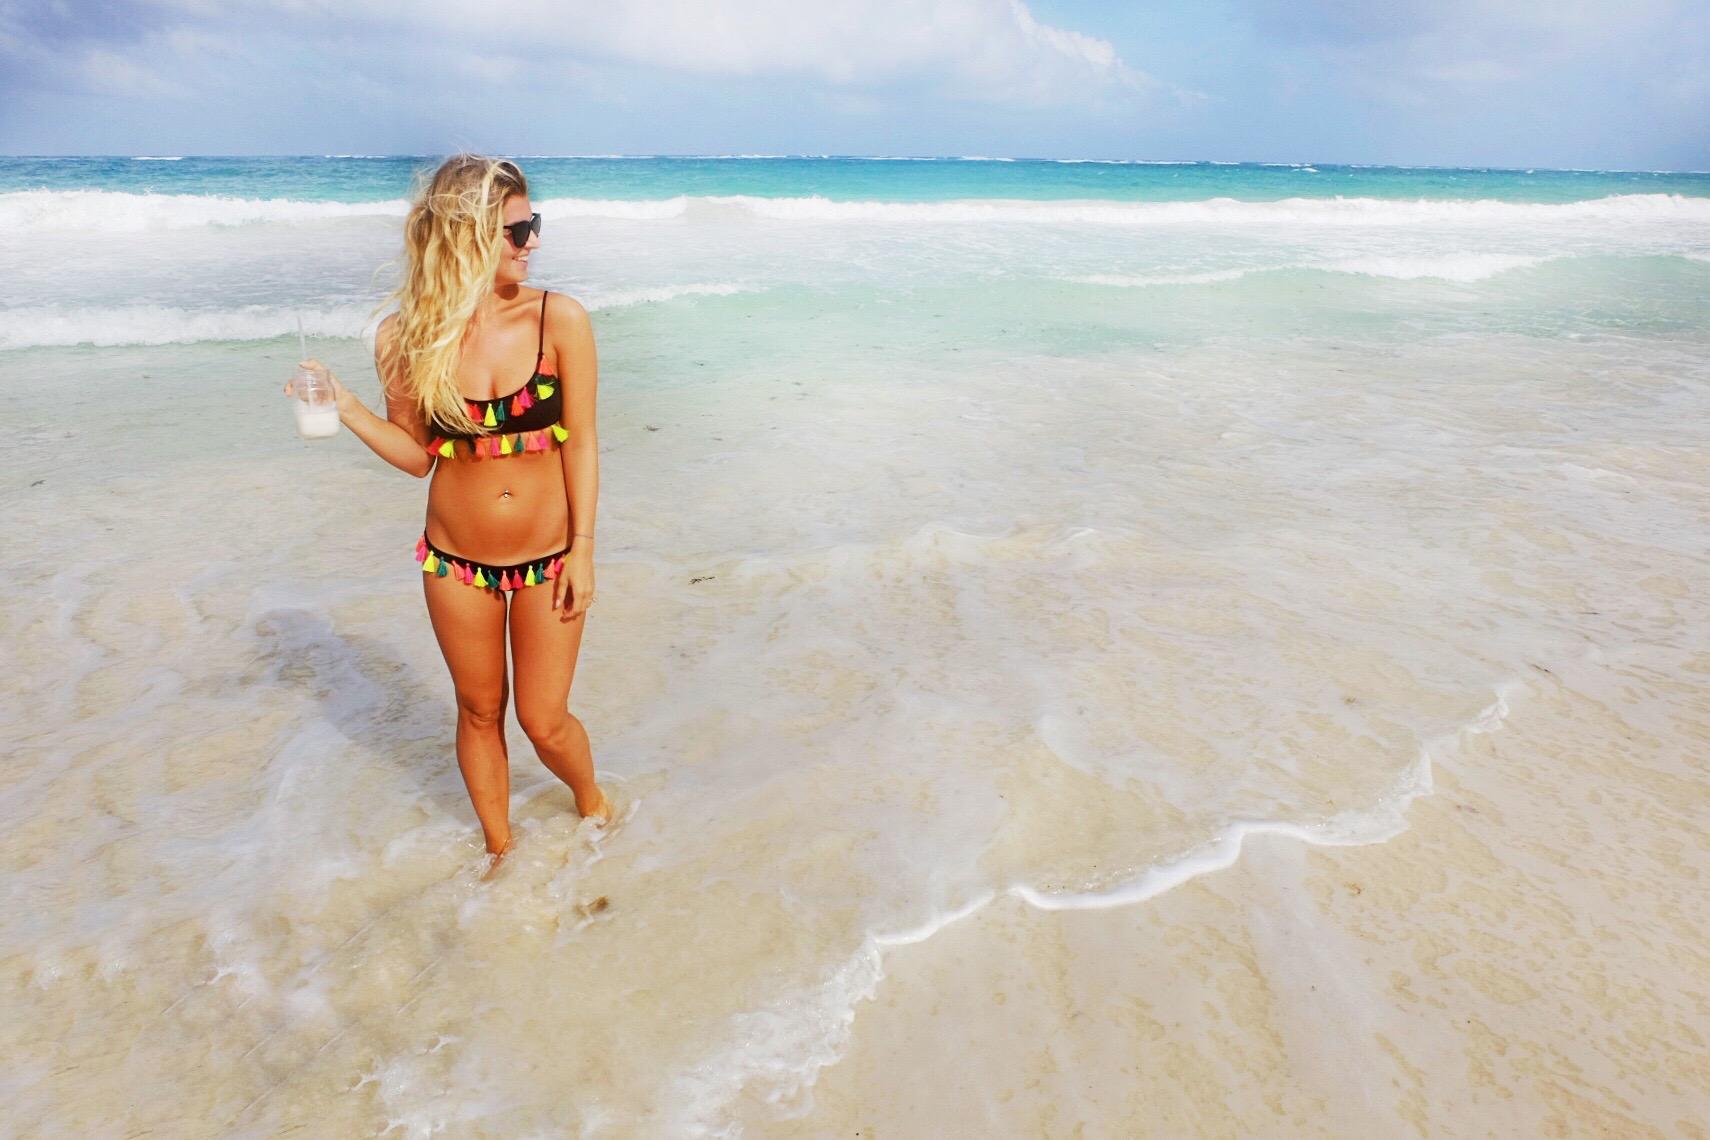 Pinata-inspired beachwear and pina coladas are essentials for Mexico